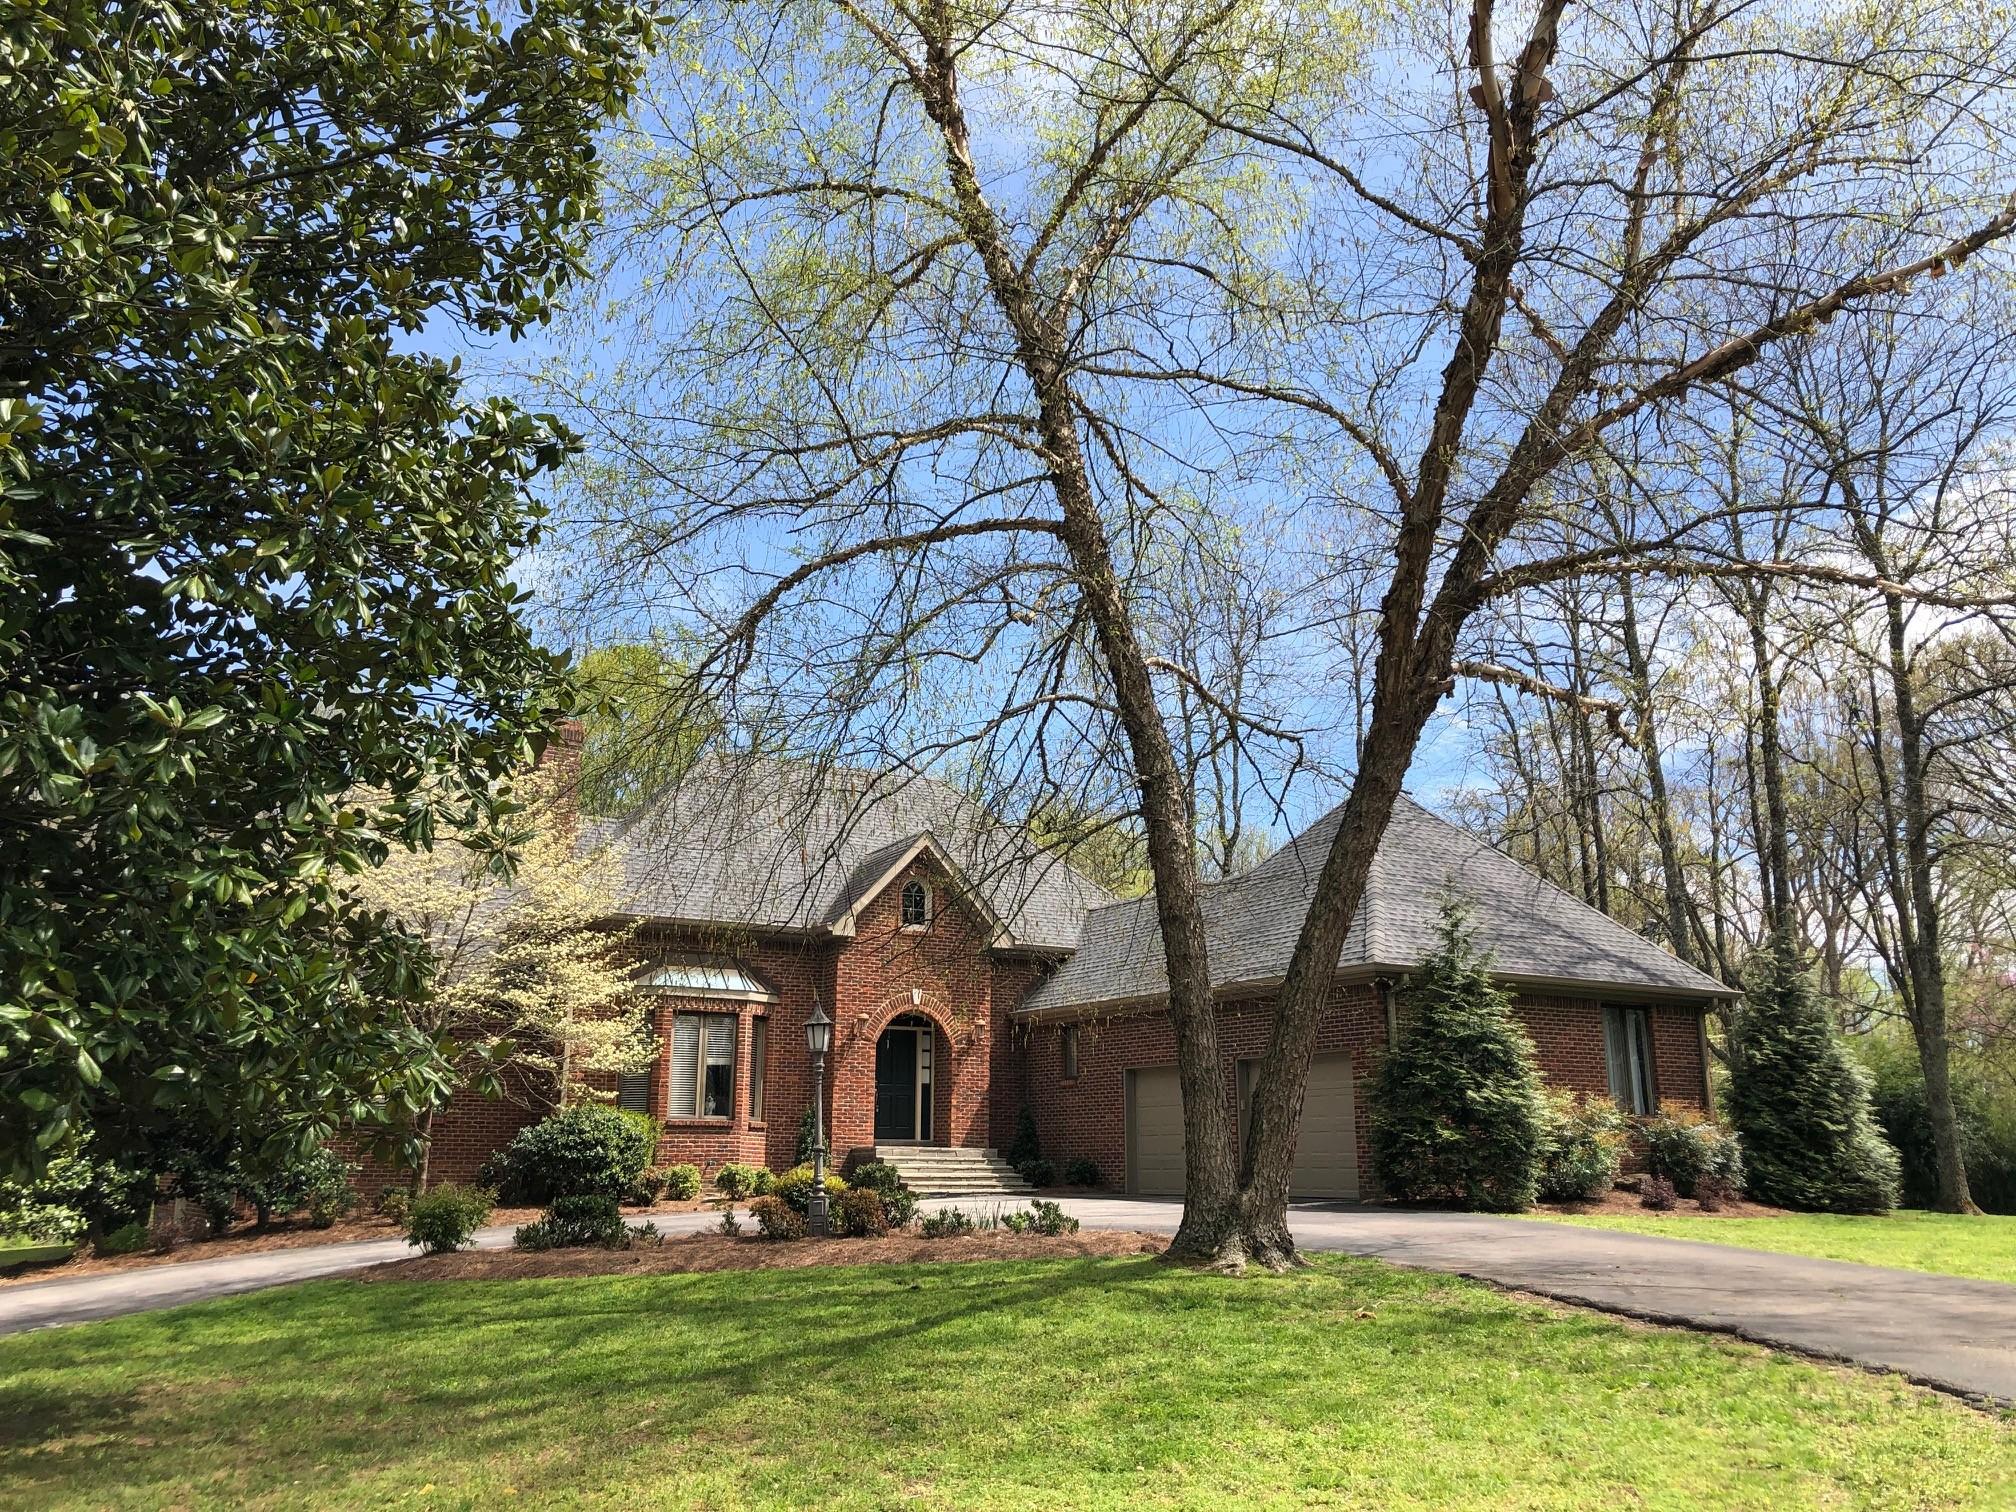 4937 Tulip Grove Ln, Hermitage, TN 37076 - Hermitage, TN real estate listing